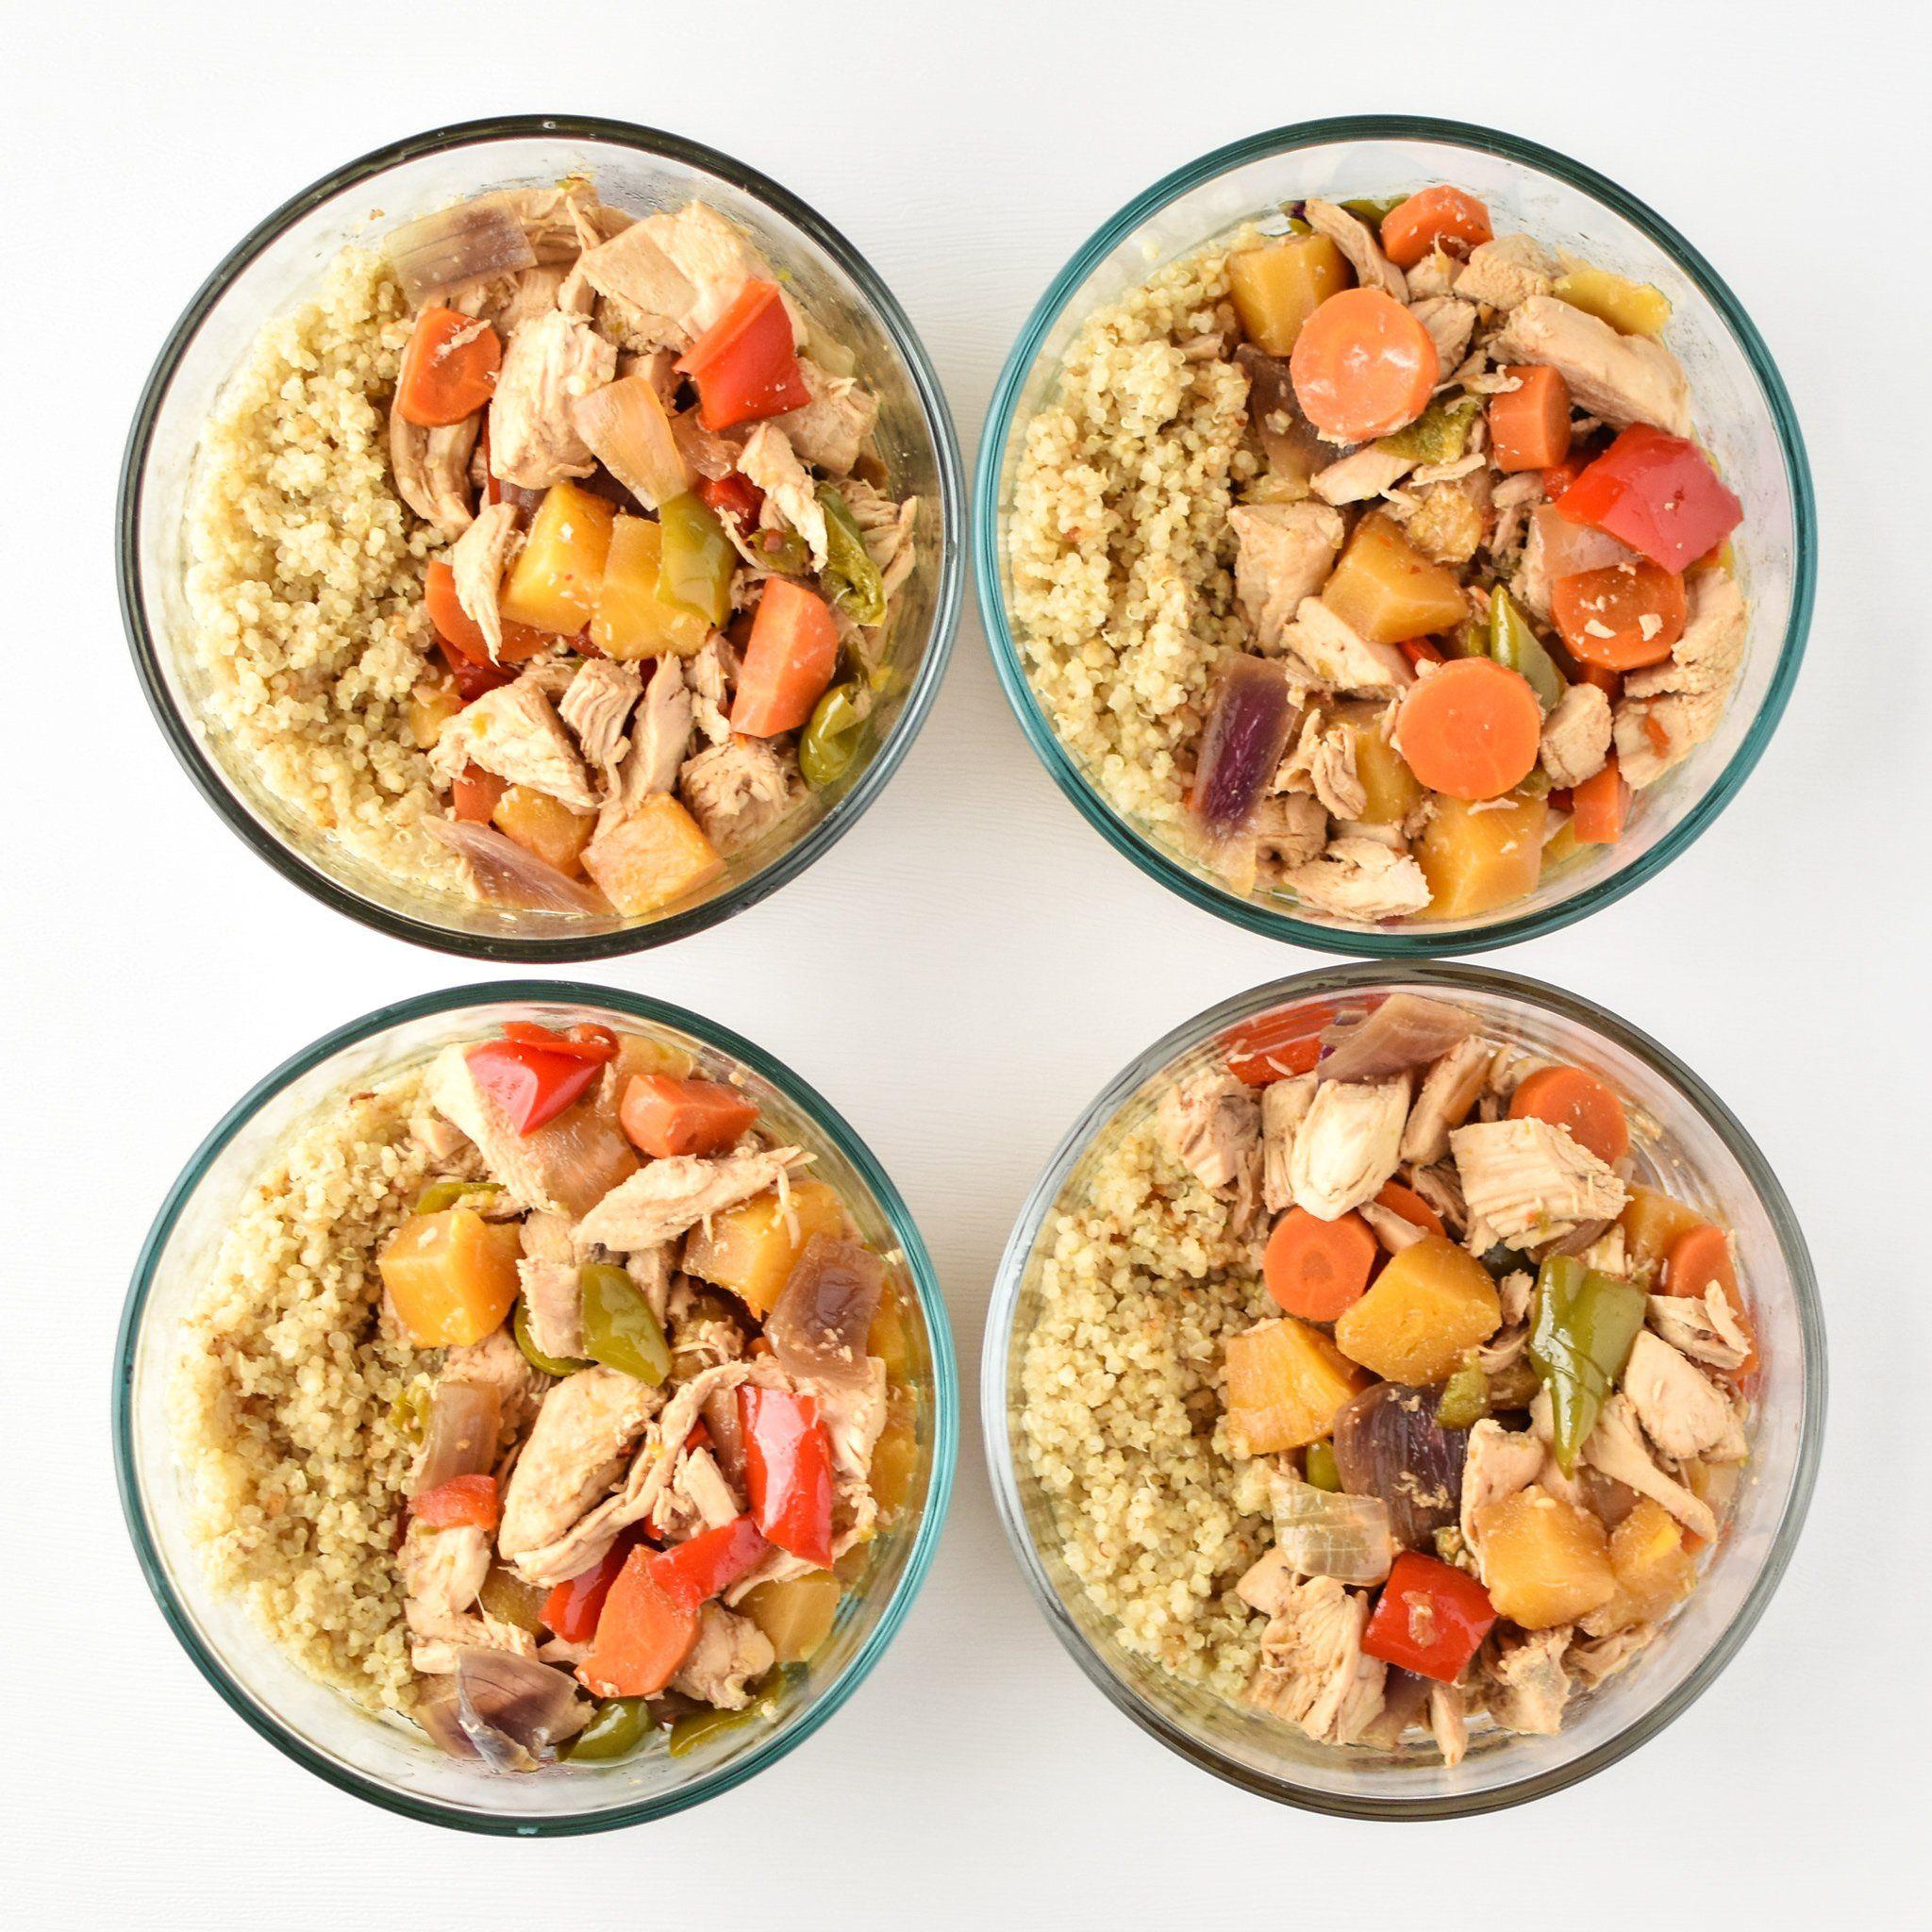 Meal Prep Slow Cooker Chicken Teriyaki Quinoa Bowls